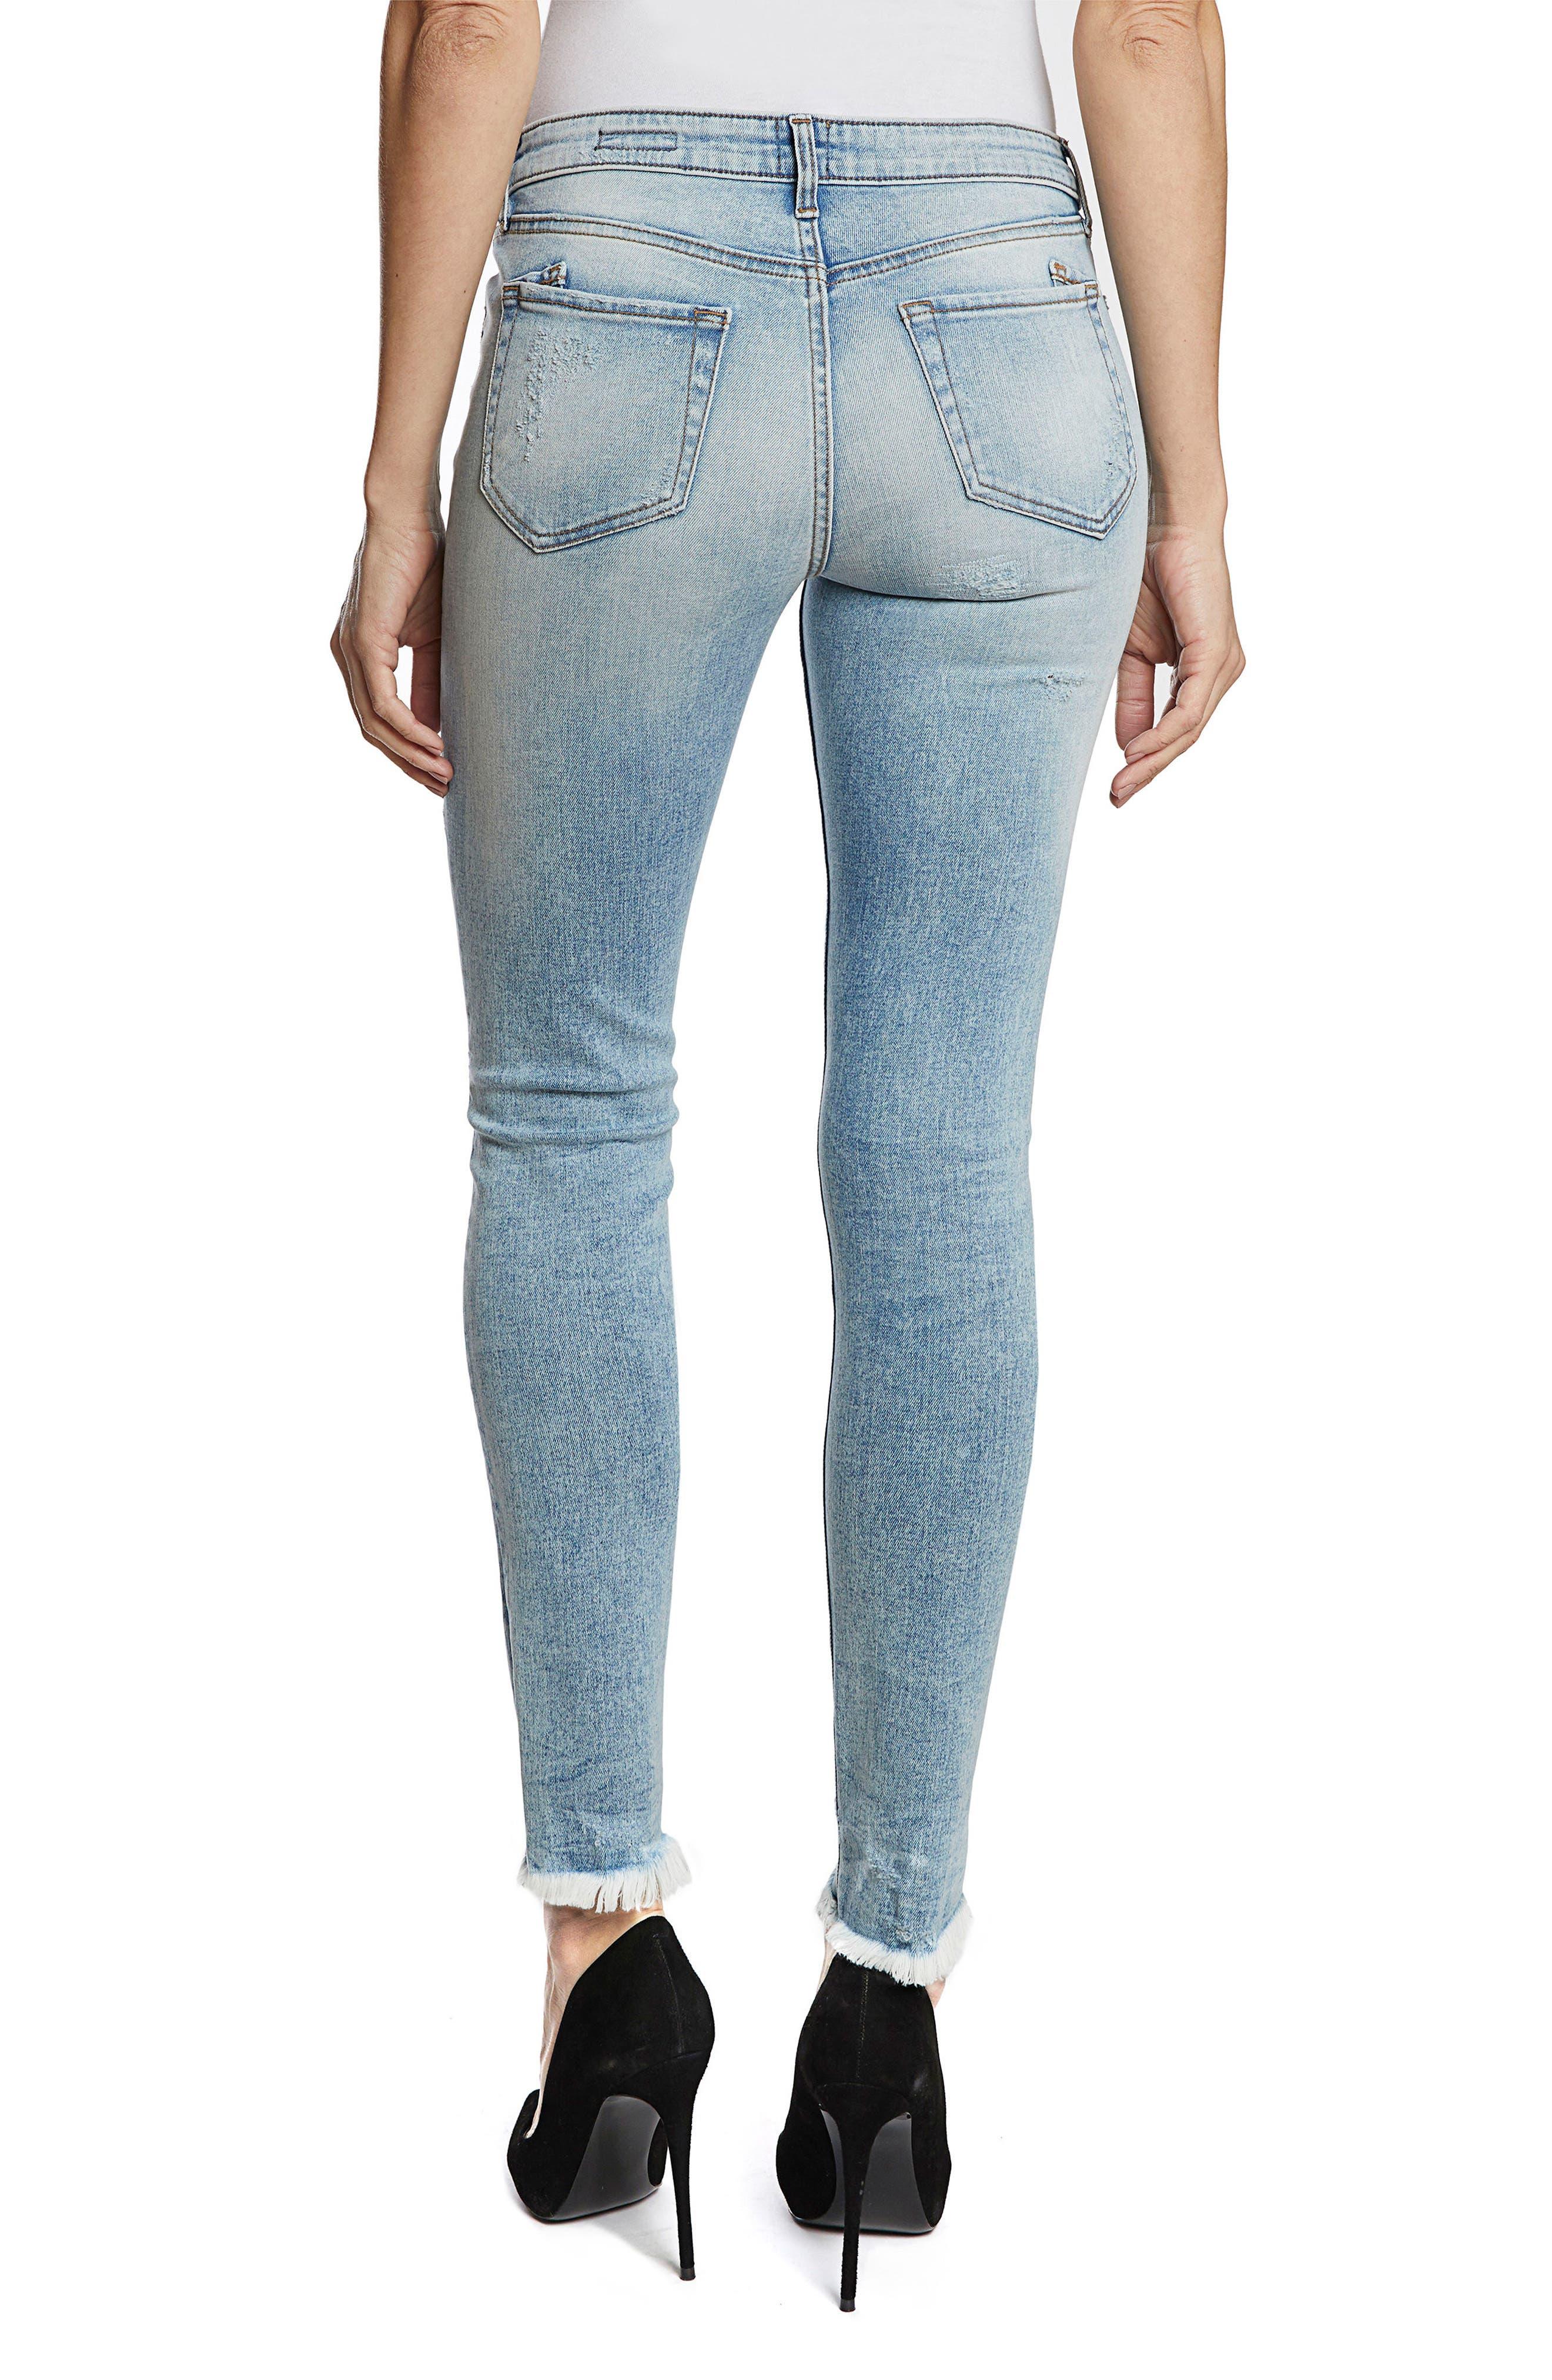 PRPS,                             Camaro Ankle Skinny Jeans,                             Alternate thumbnail 2, color,                             490